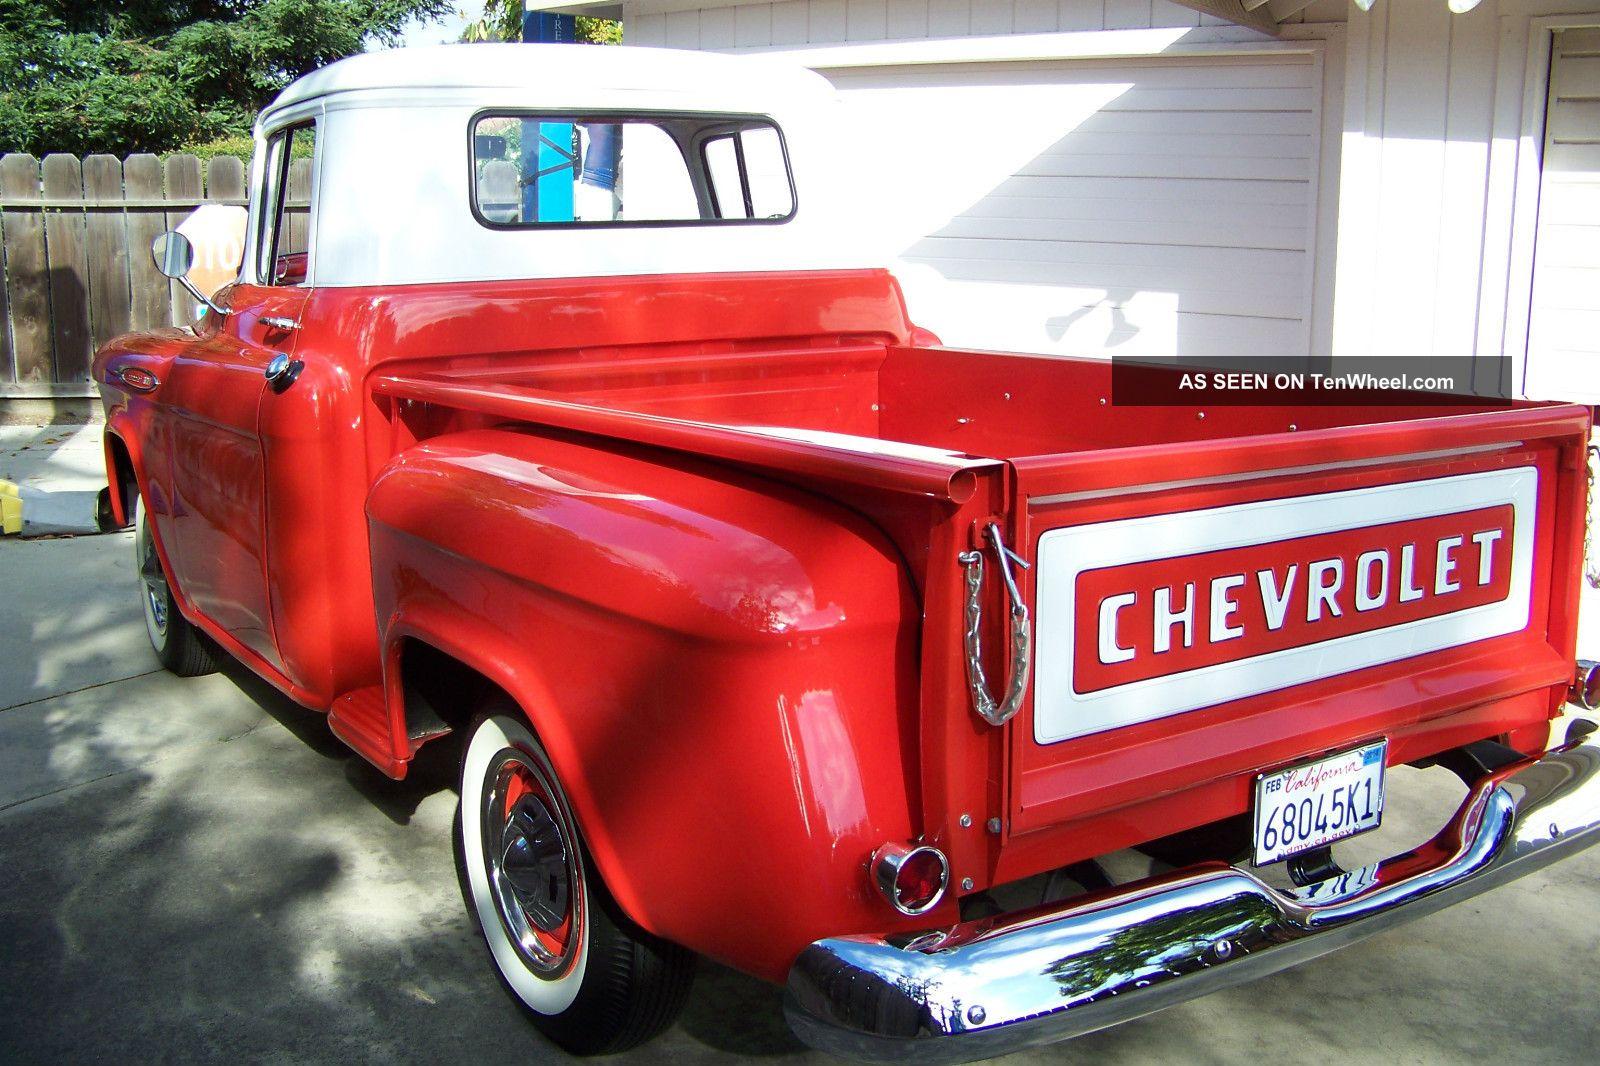 1957 chevrolet 3100 sb pickup truck small window stock. Black Bedroom Furniture Sets. Home Design Ideas